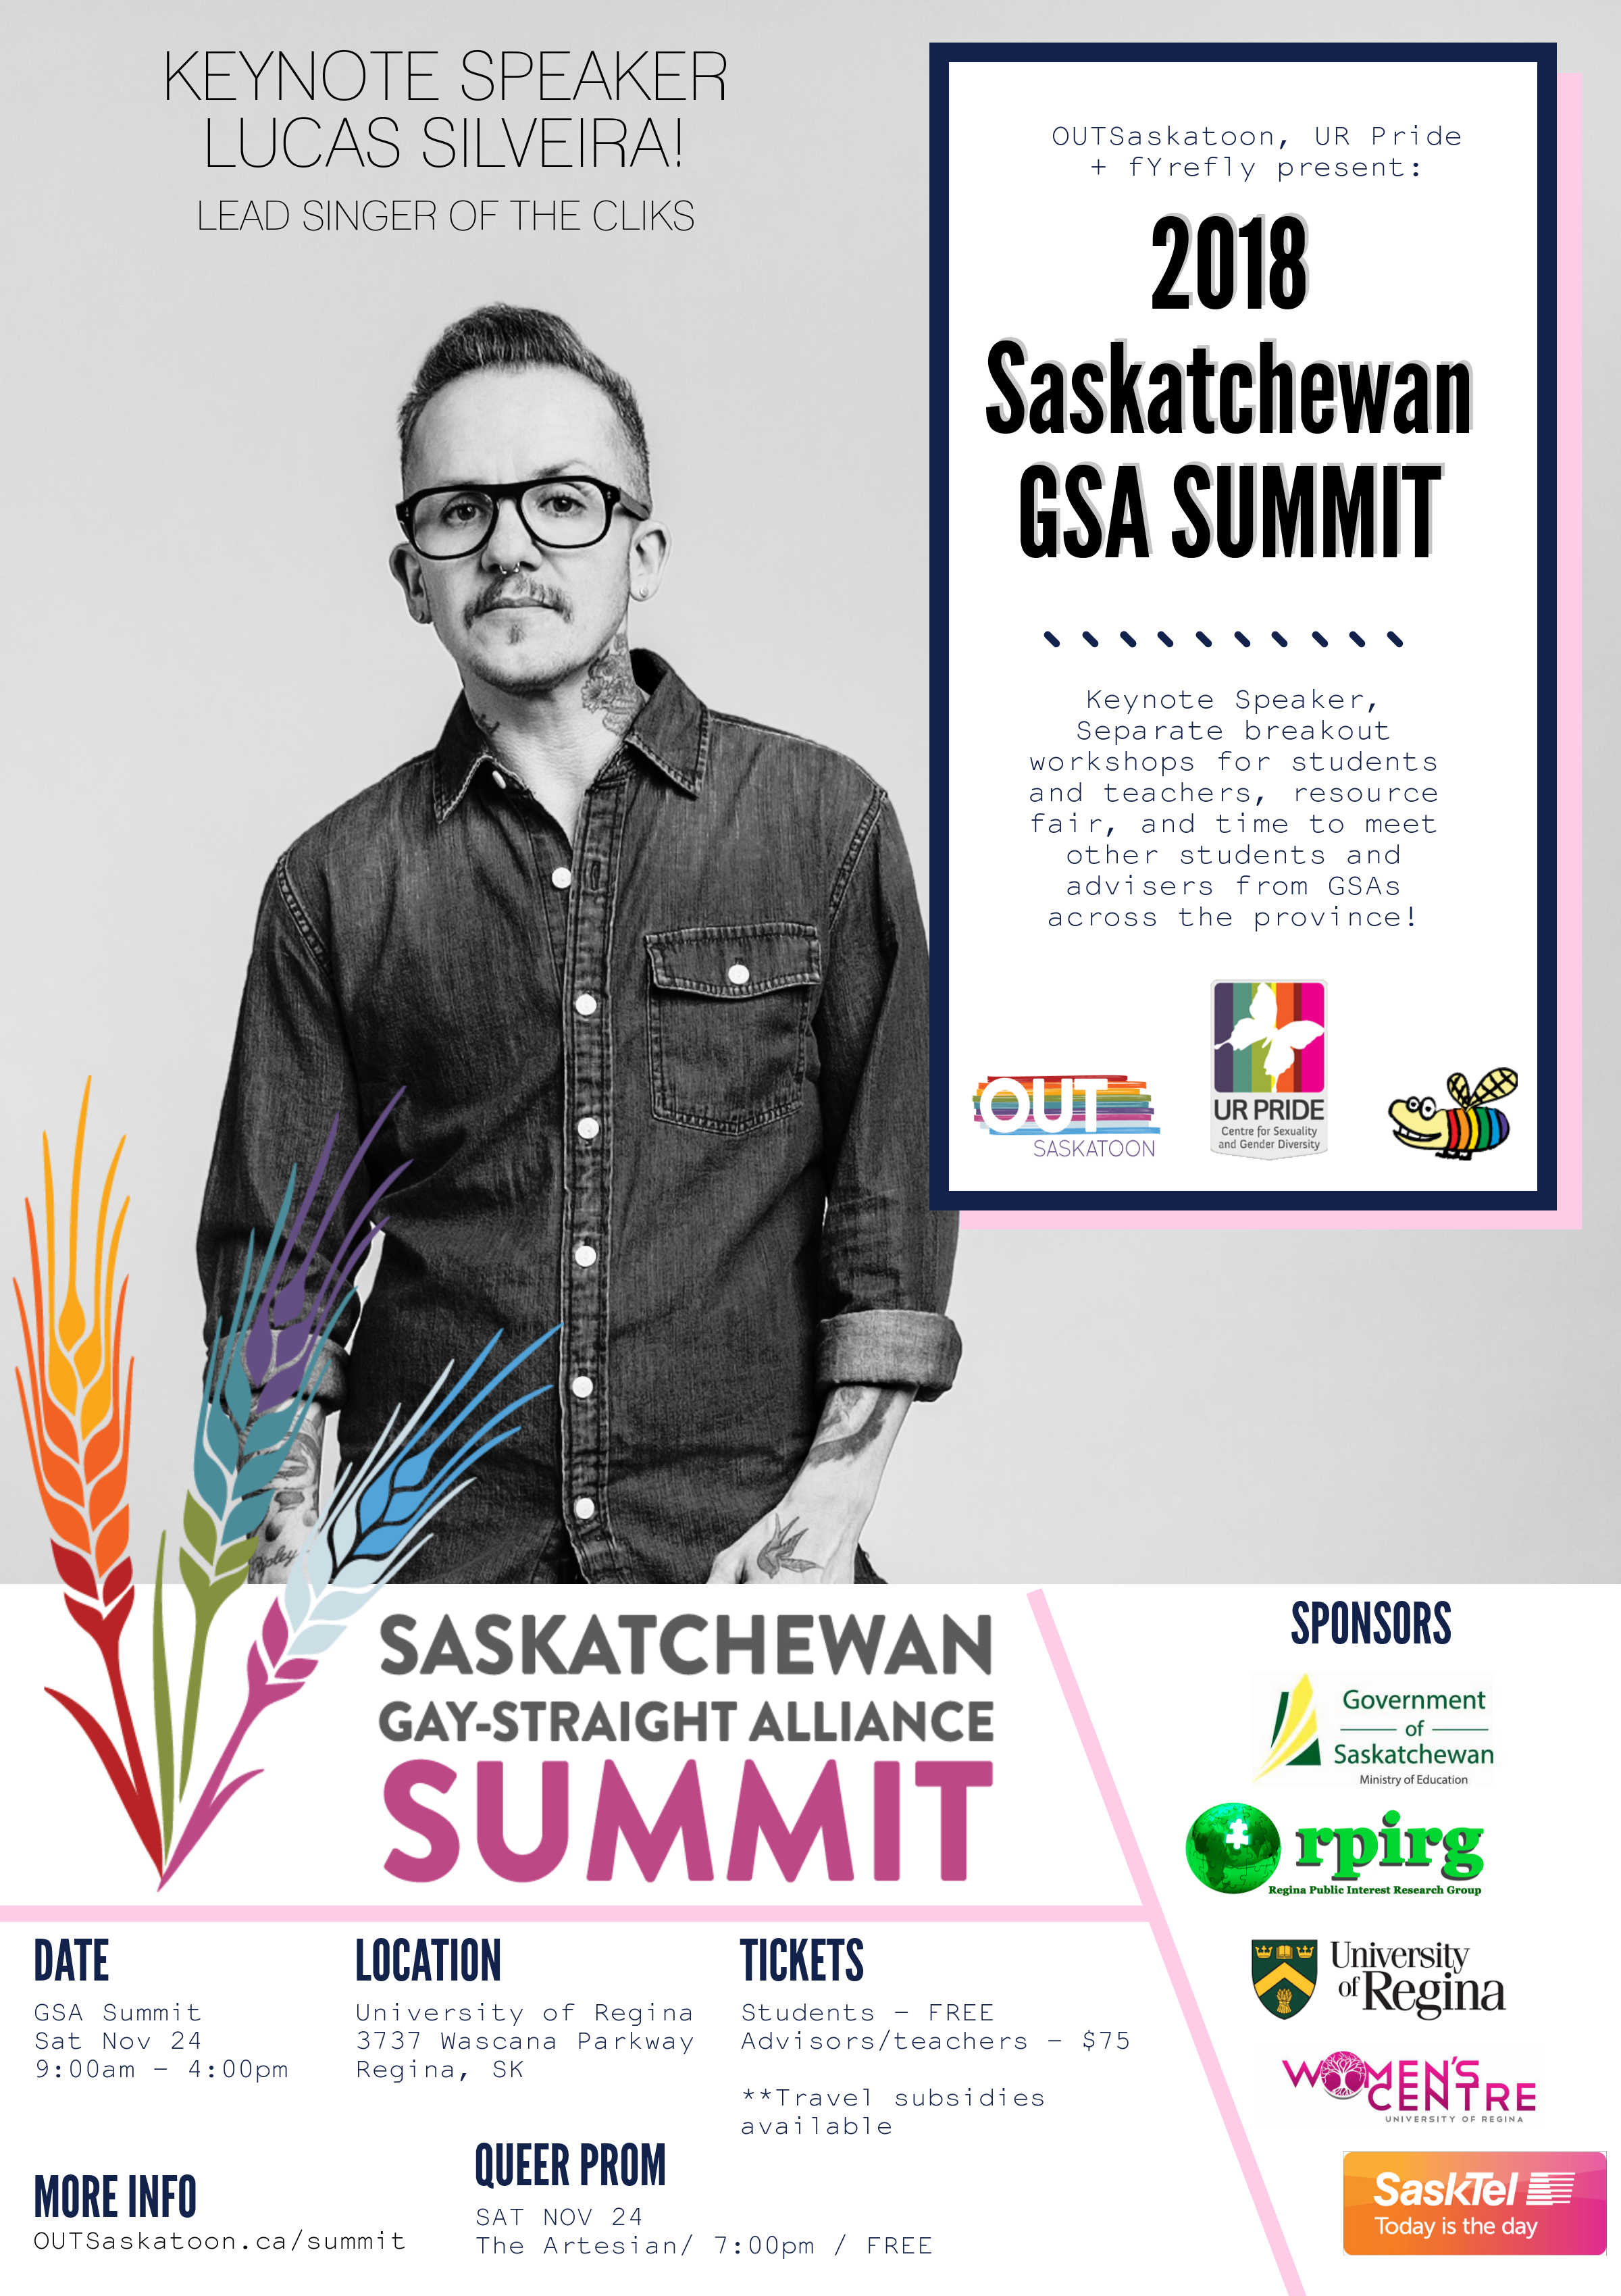 gay incontri Saskatchewan dating agenzia Cyrano EP 14 dramabeans